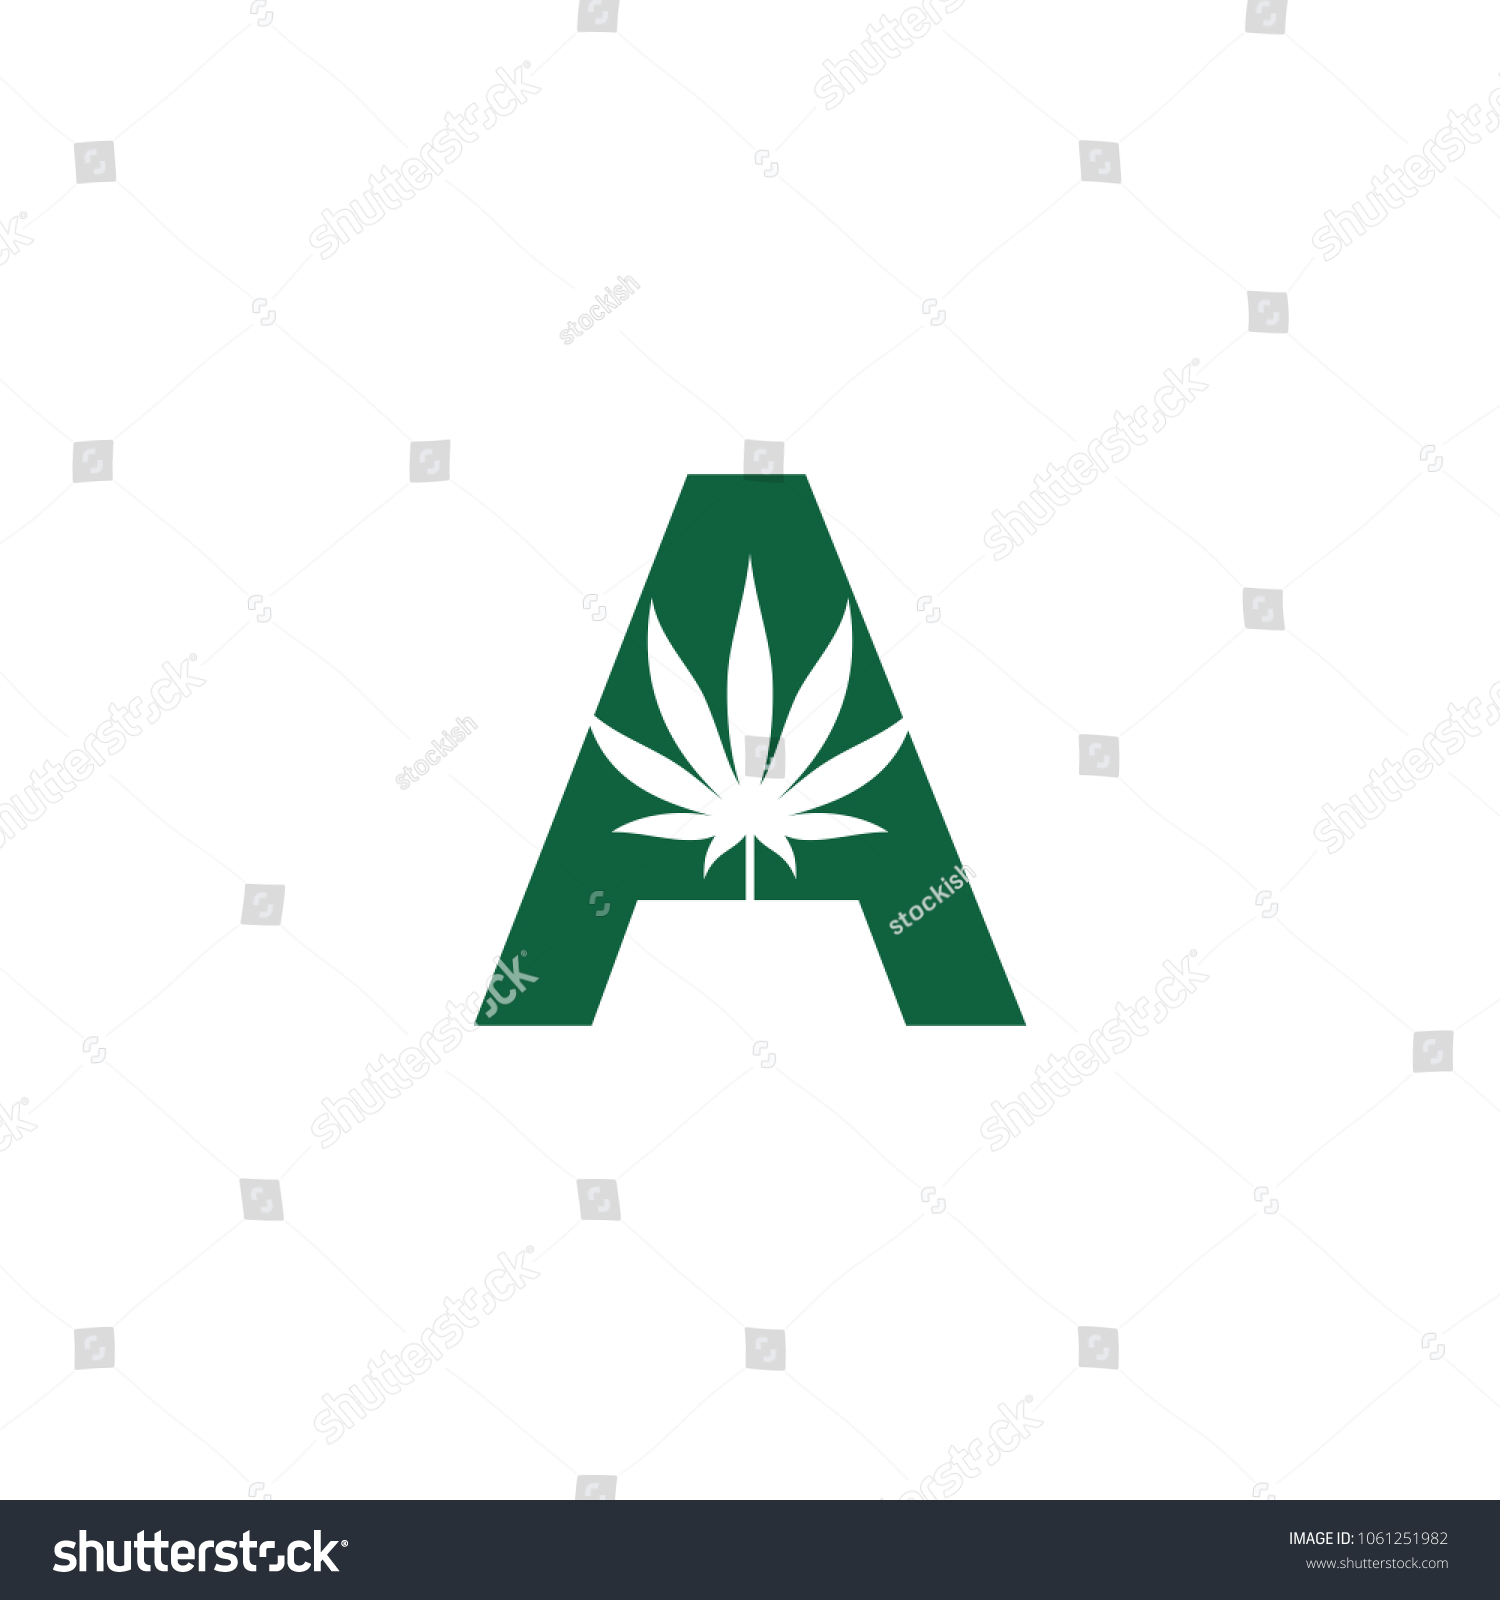 Cannabis medical logo vector marijuana icon stock vector 1061251982 cannabis for medical logo vector marijuana icon weed and hemp symbol biocorpaavc Choice Image